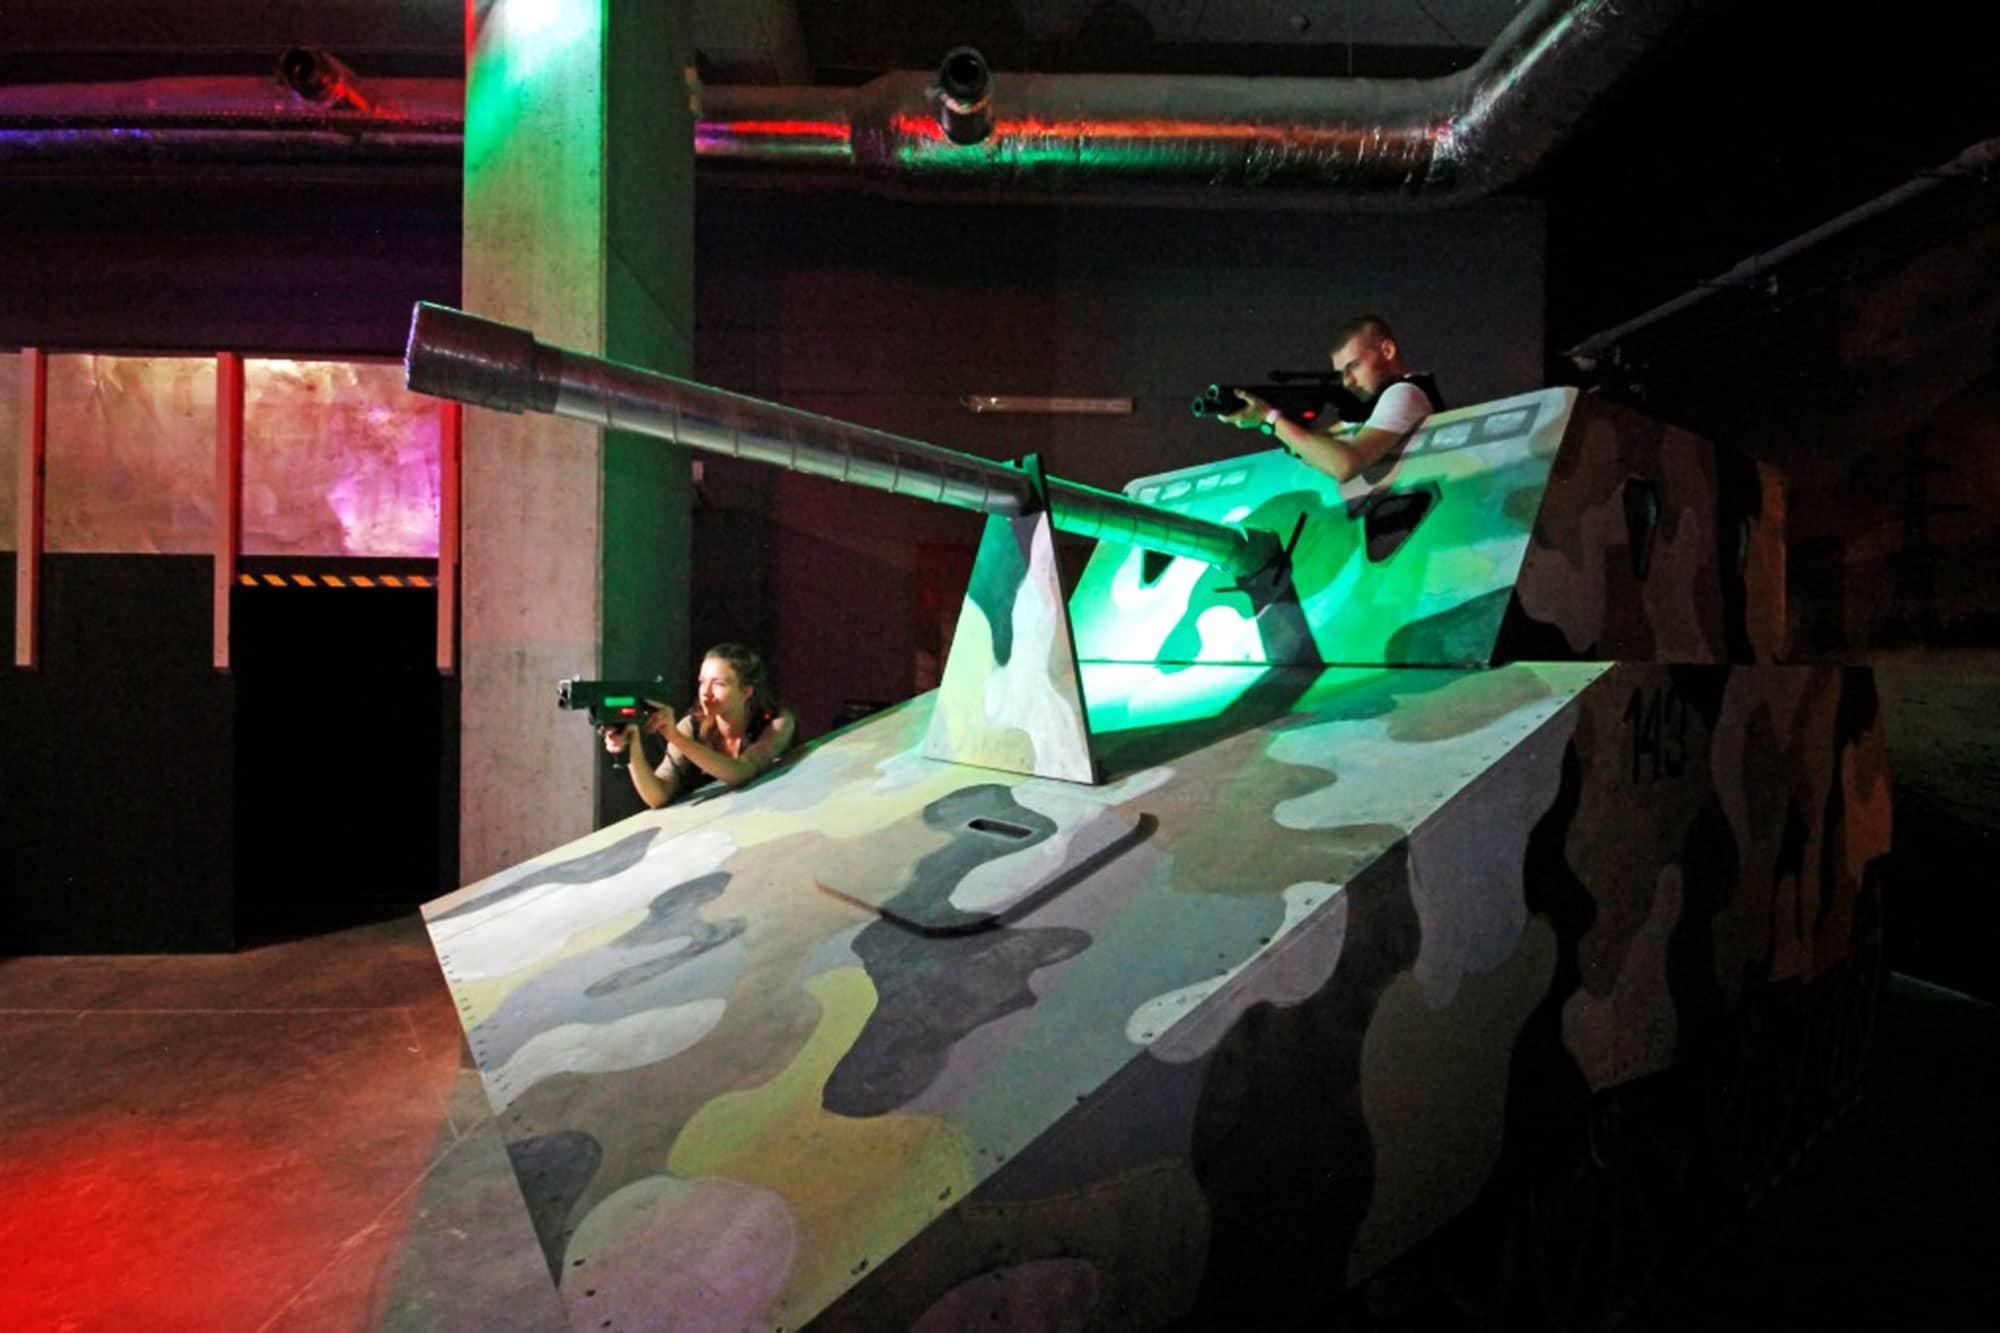 Dölj bakom kommunisttanken under lasertaggen gdansk-spelet